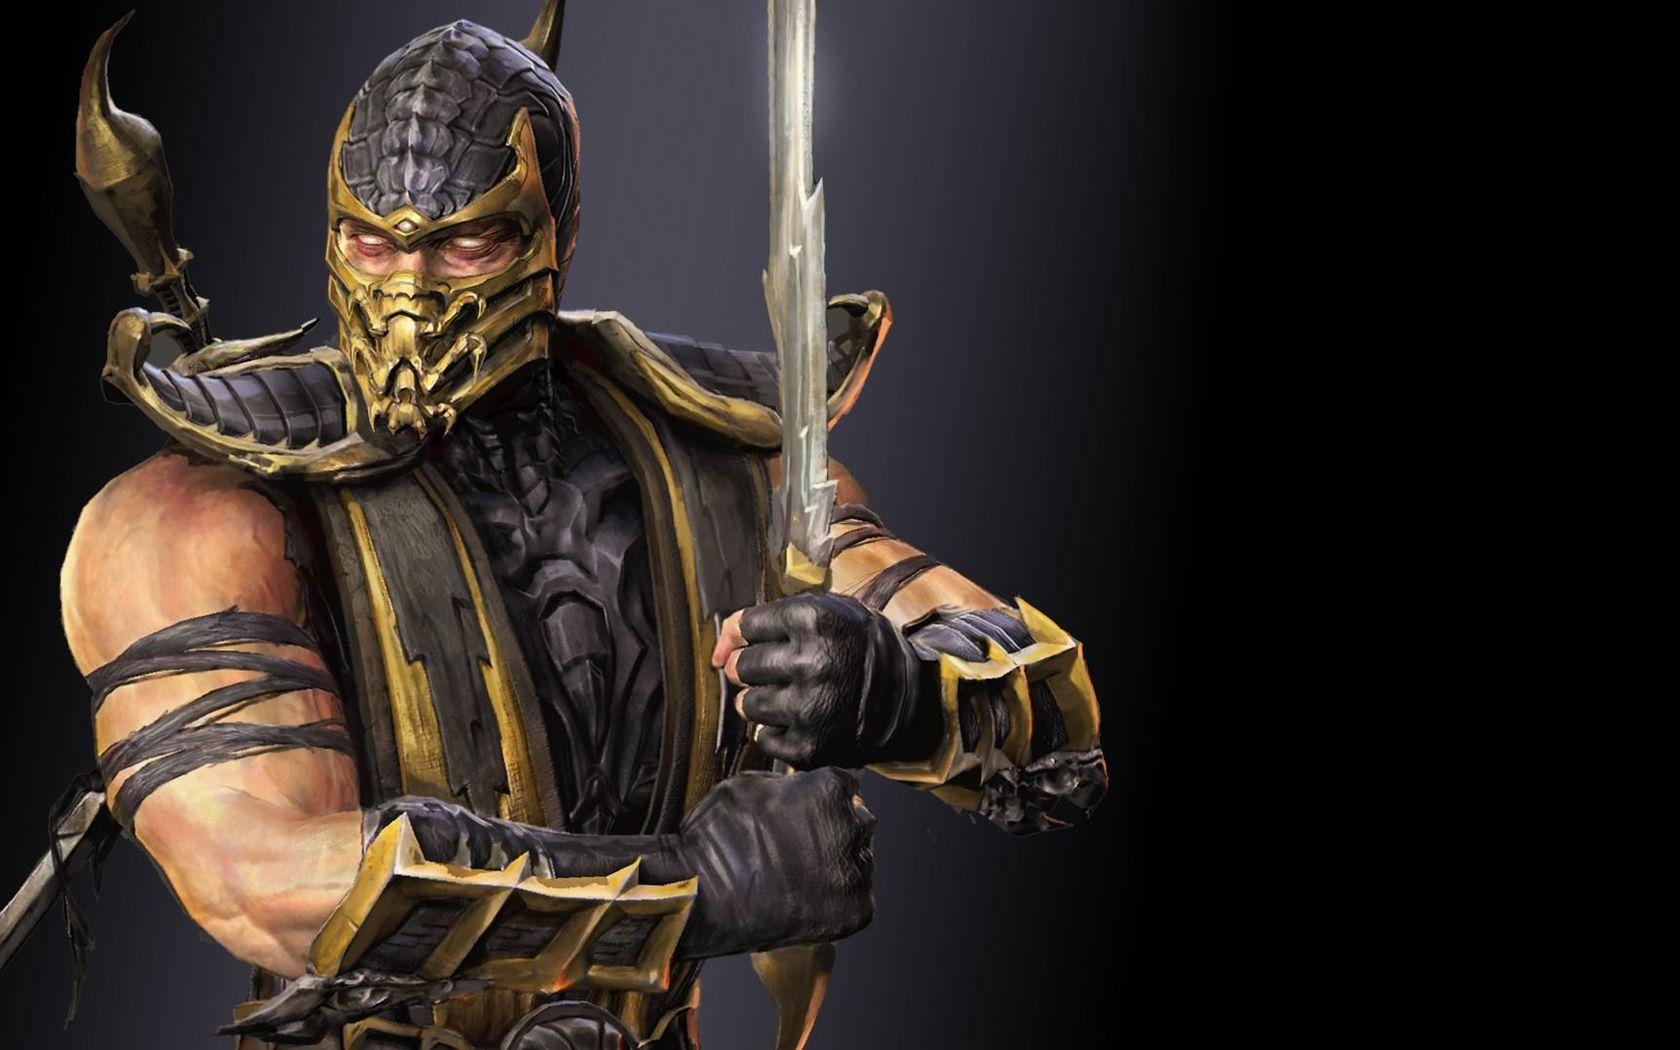 Scorpion   Mortal Kombat wallpaper 18677 1680x1050